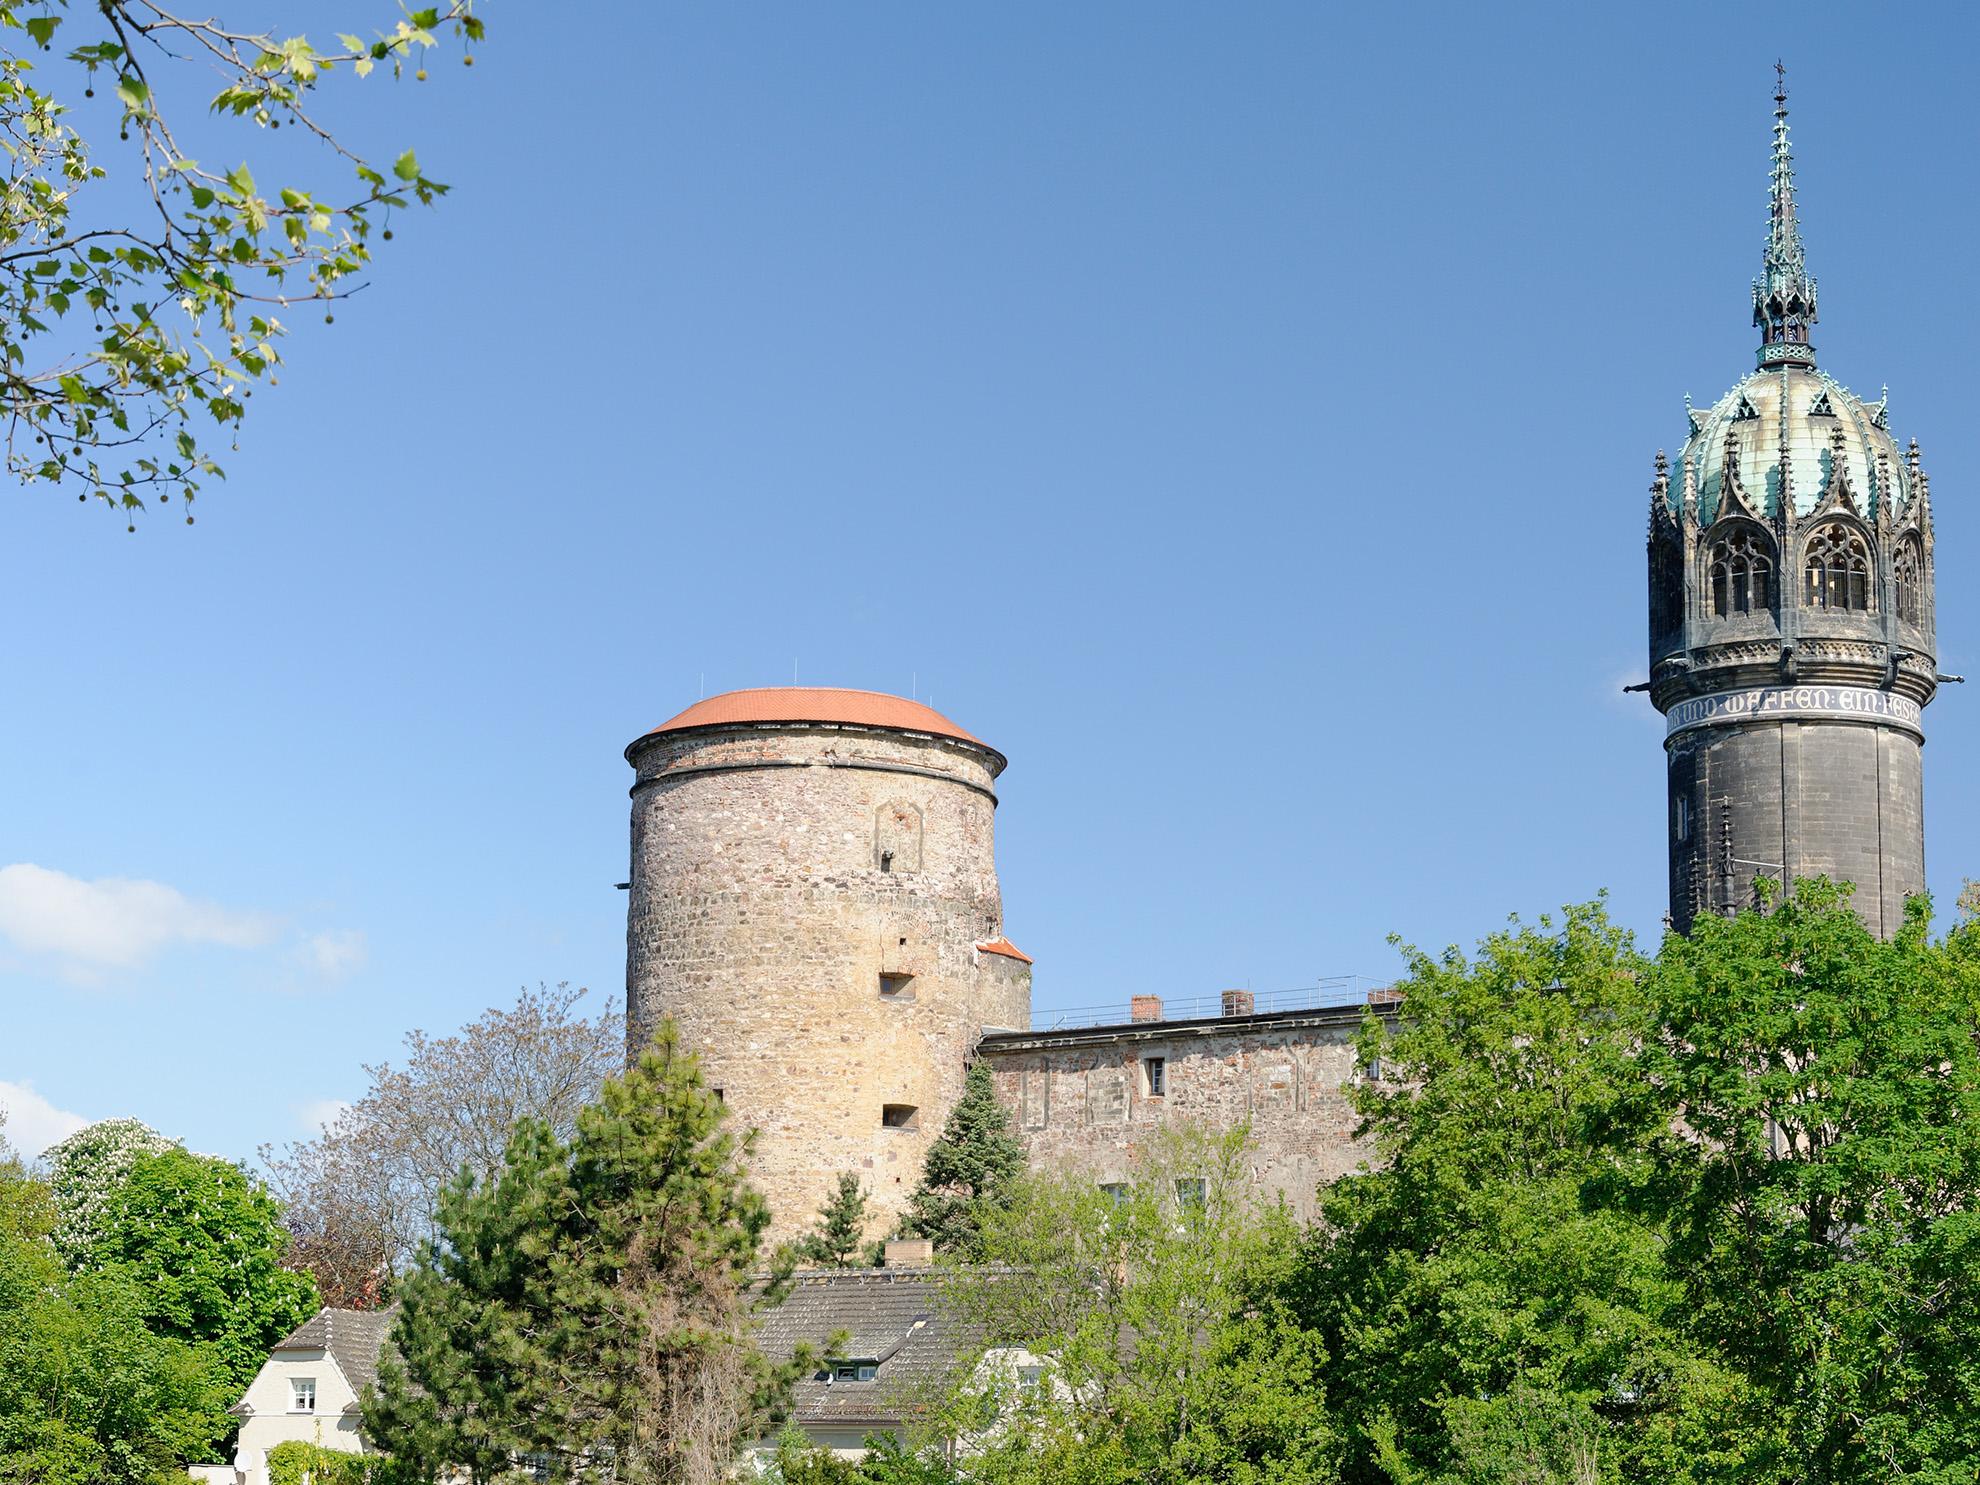 Schlosskirche Wittenberg - Wittenberg, Germany